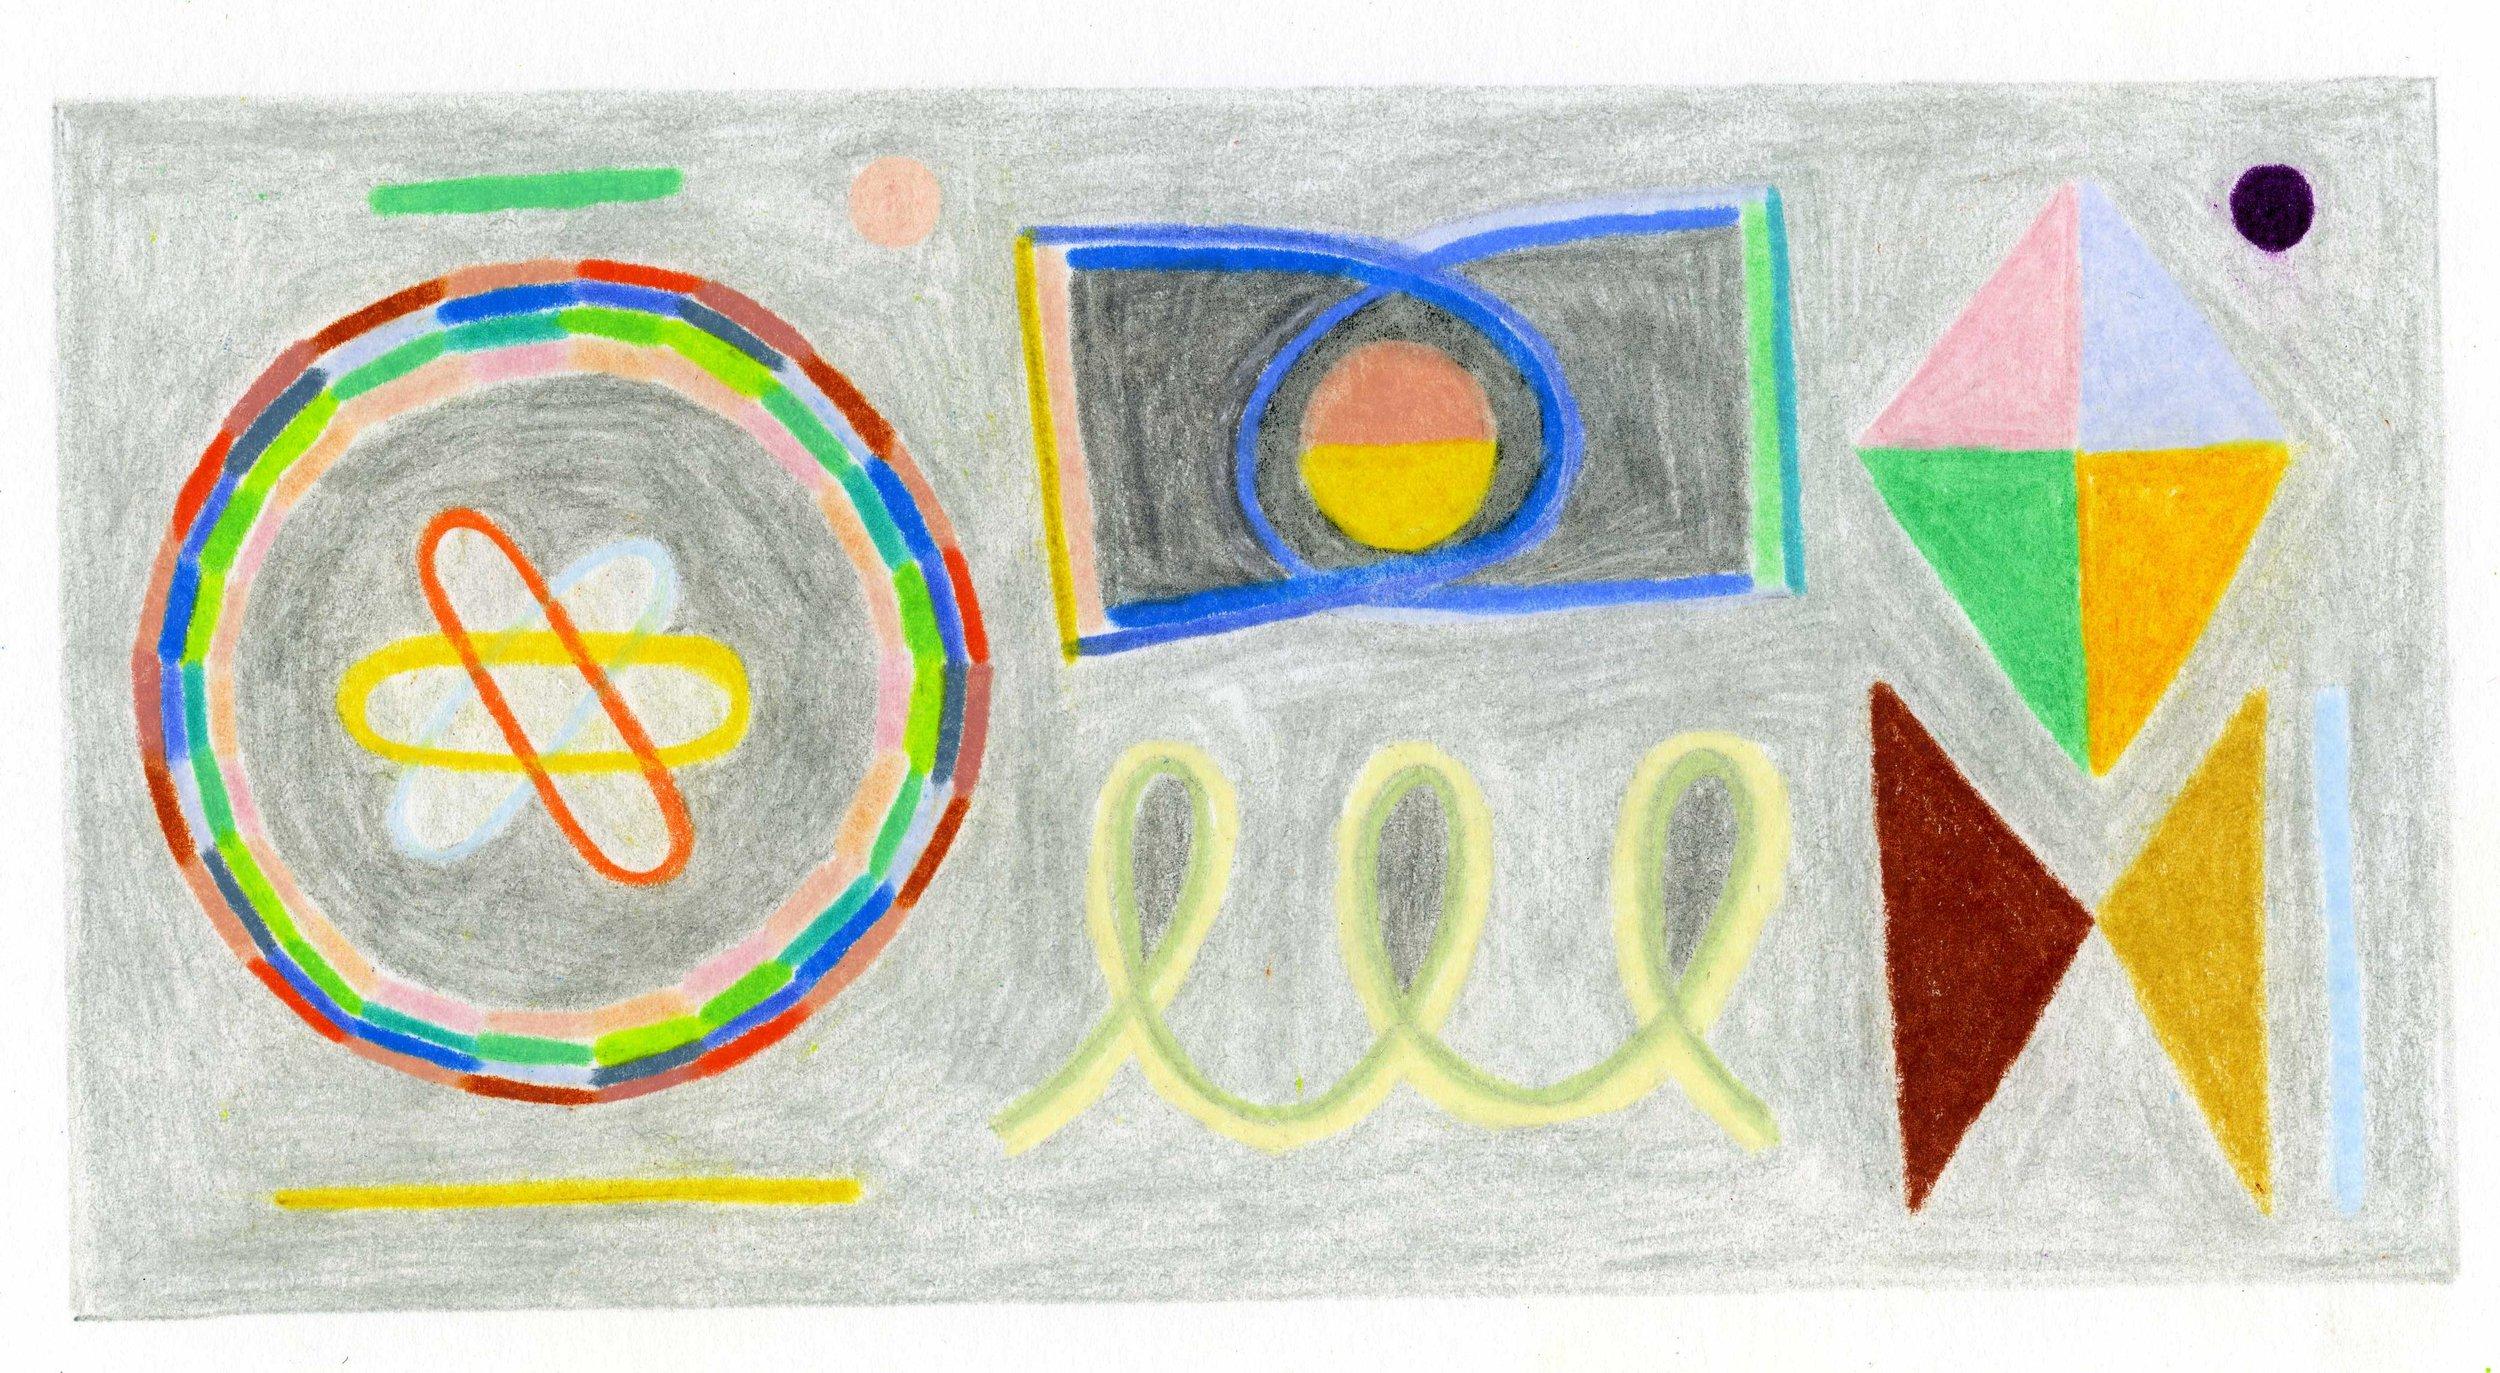 "Mid Century Science   3.5"" x 6.75""  colored pencil on bristol paper  2019"